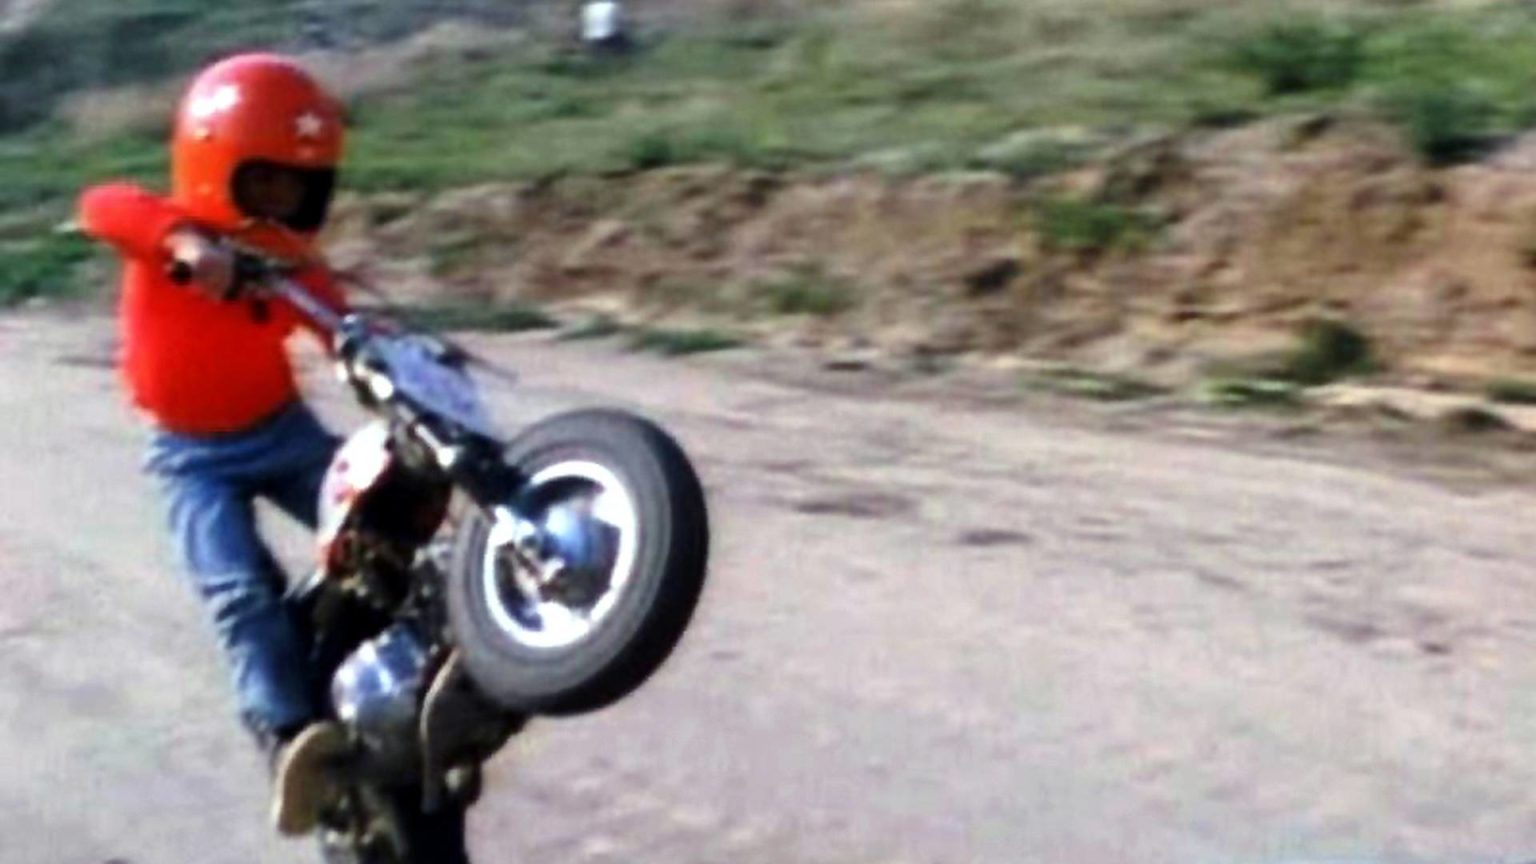 [Imagem: on-any-sunday-1971-moto-movie-review-7-1536x864.jpg]